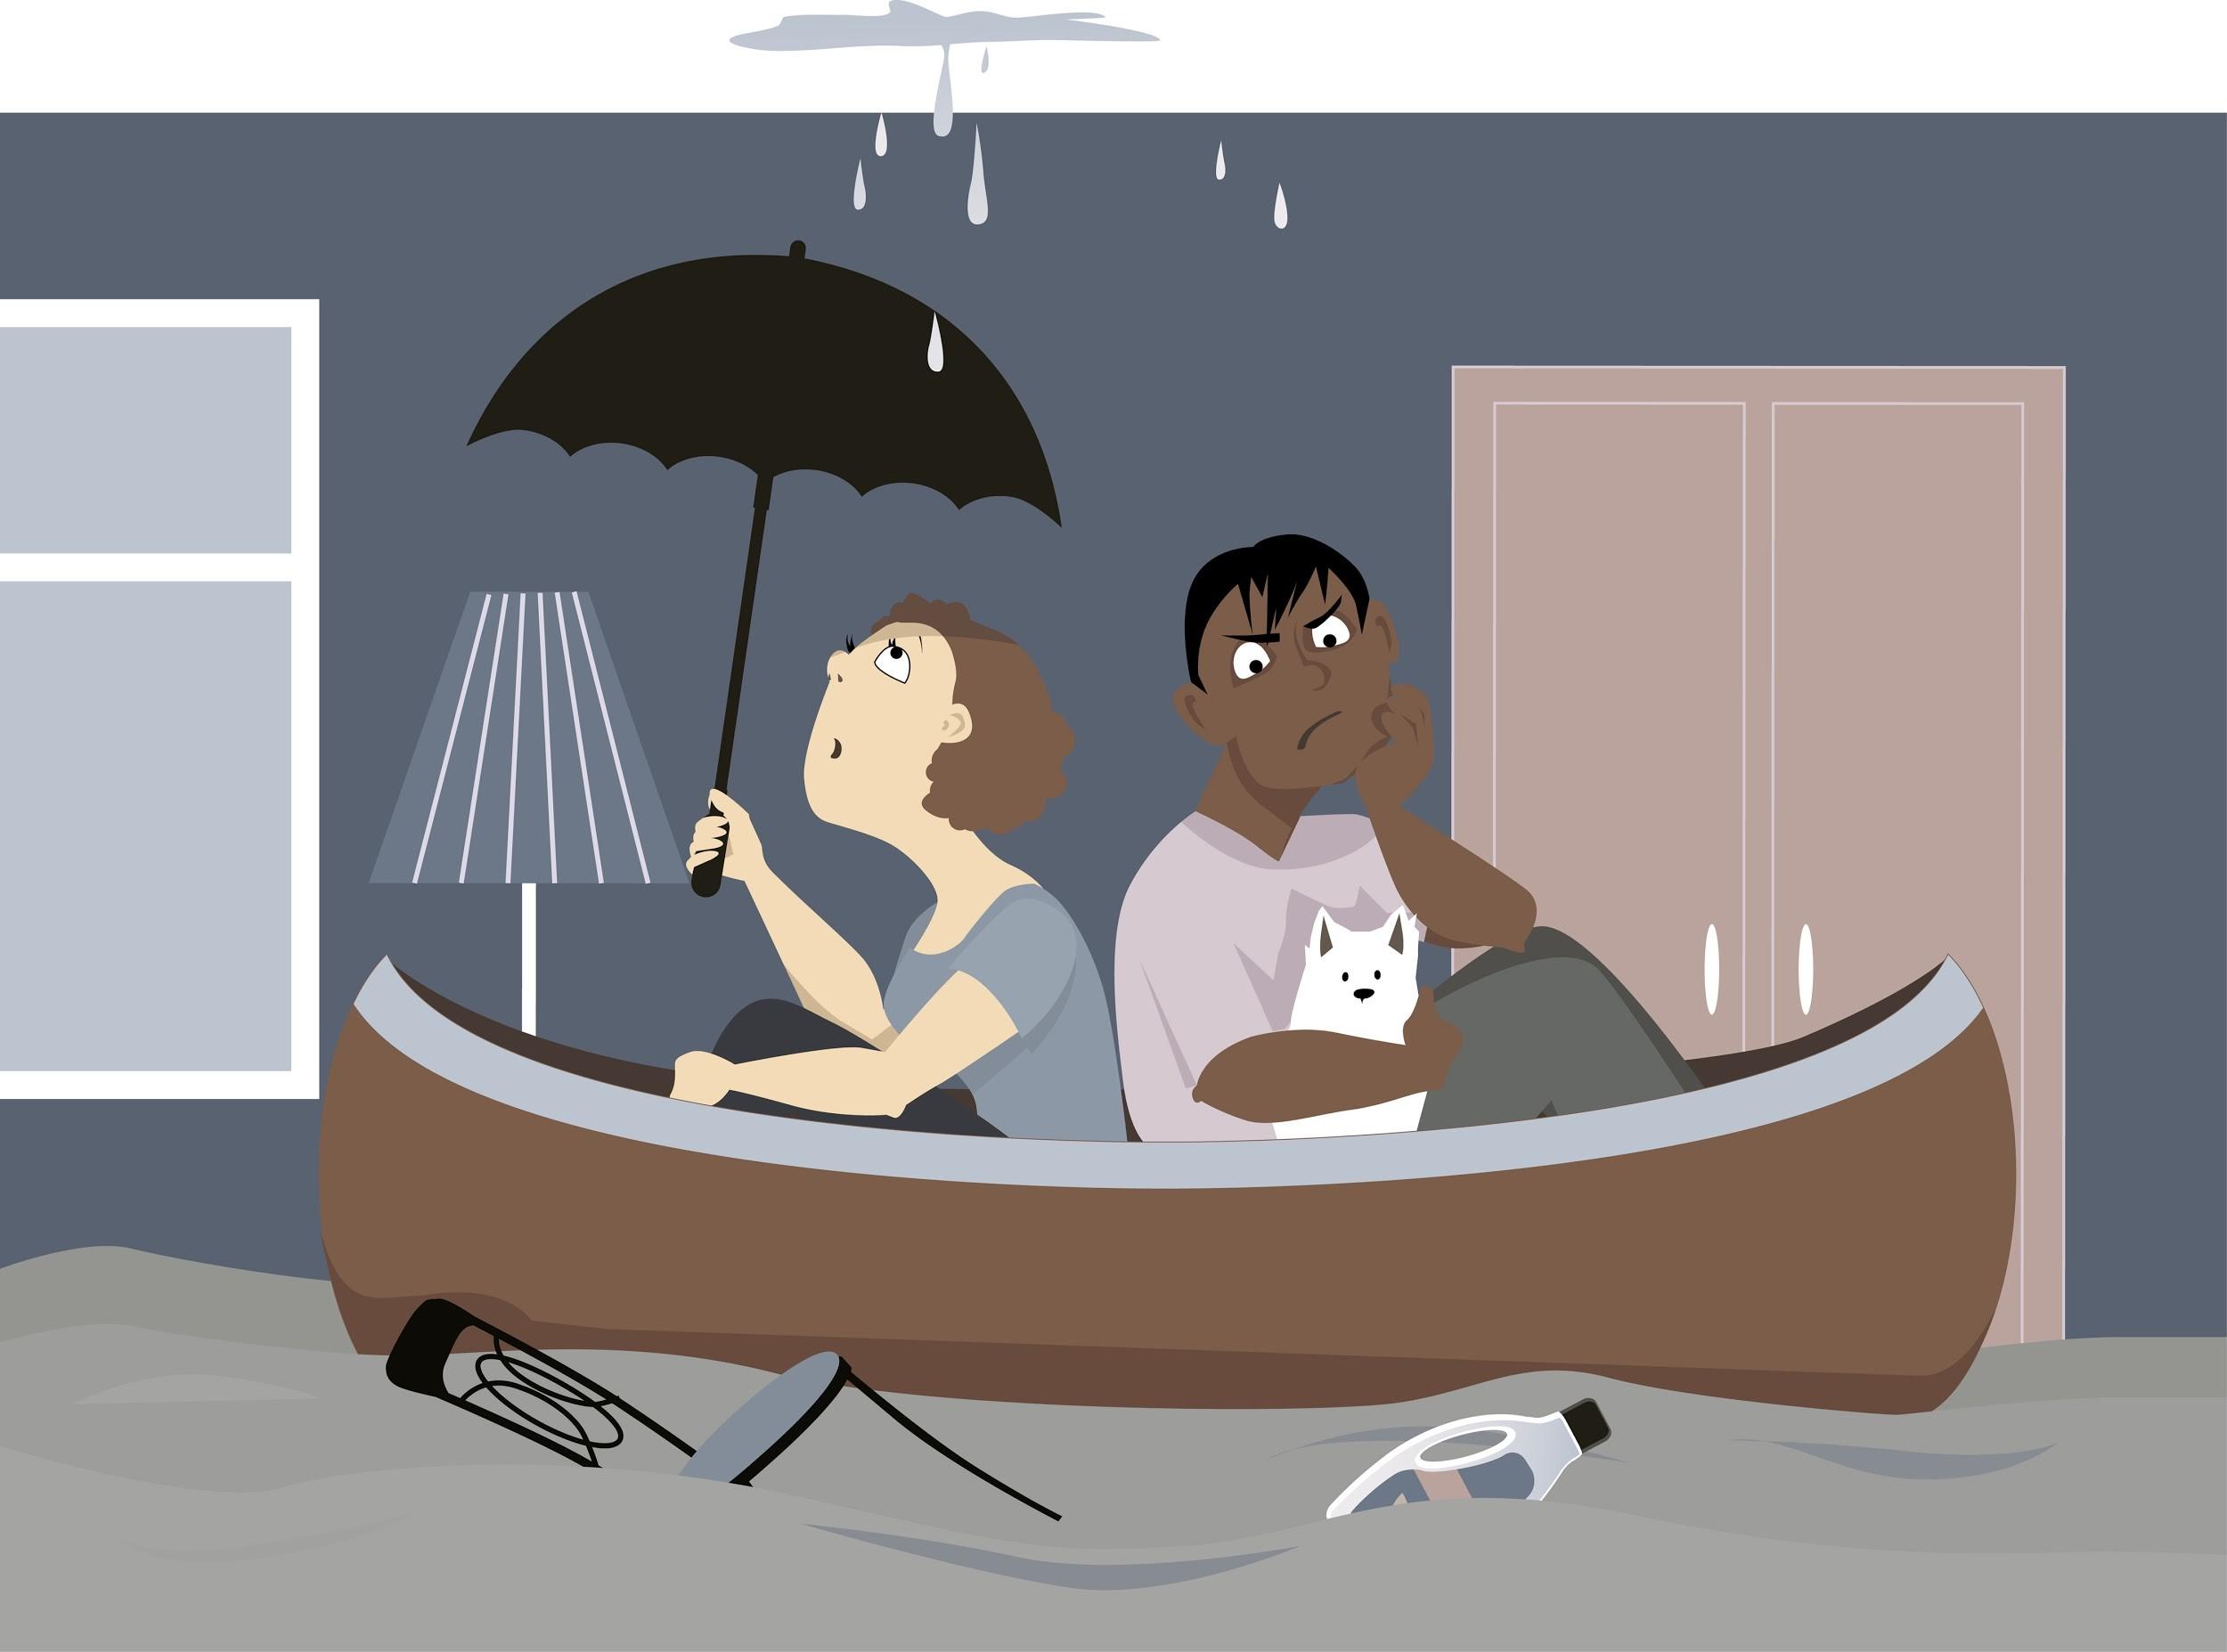 assurance-habitat-sinistre-degats-appartement-annexx